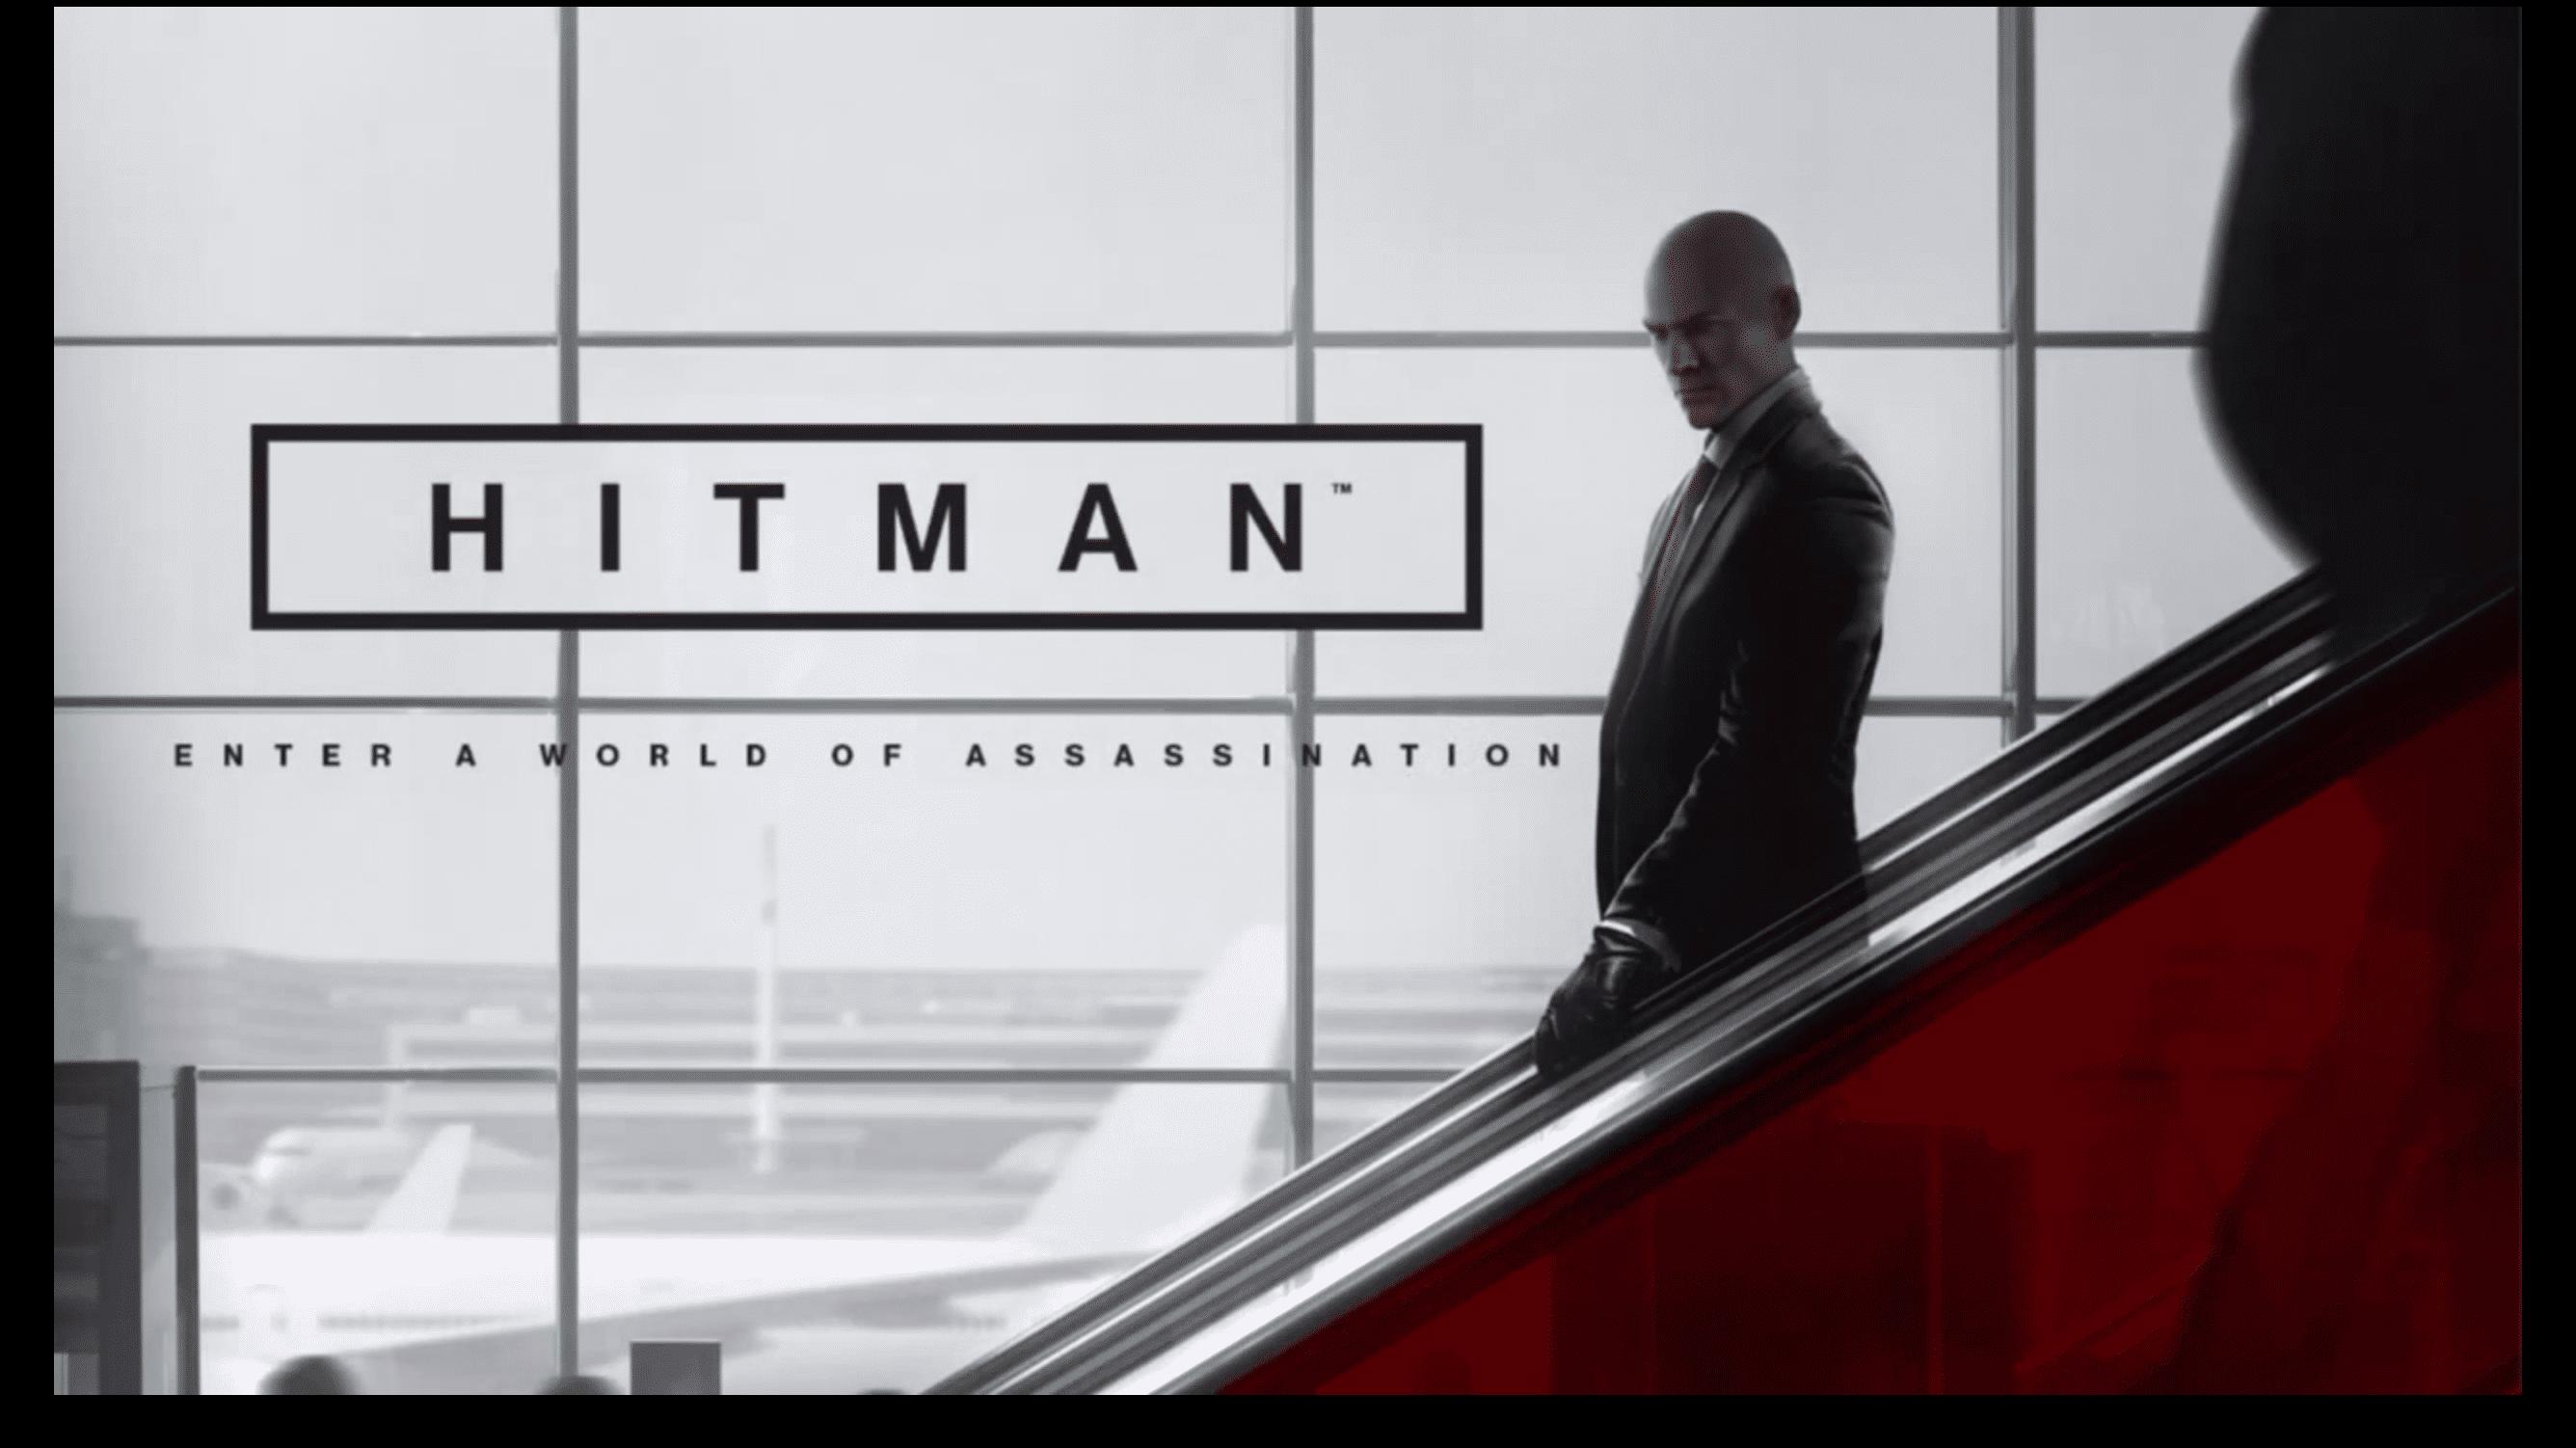 E3: Hitman Veröffentlichung